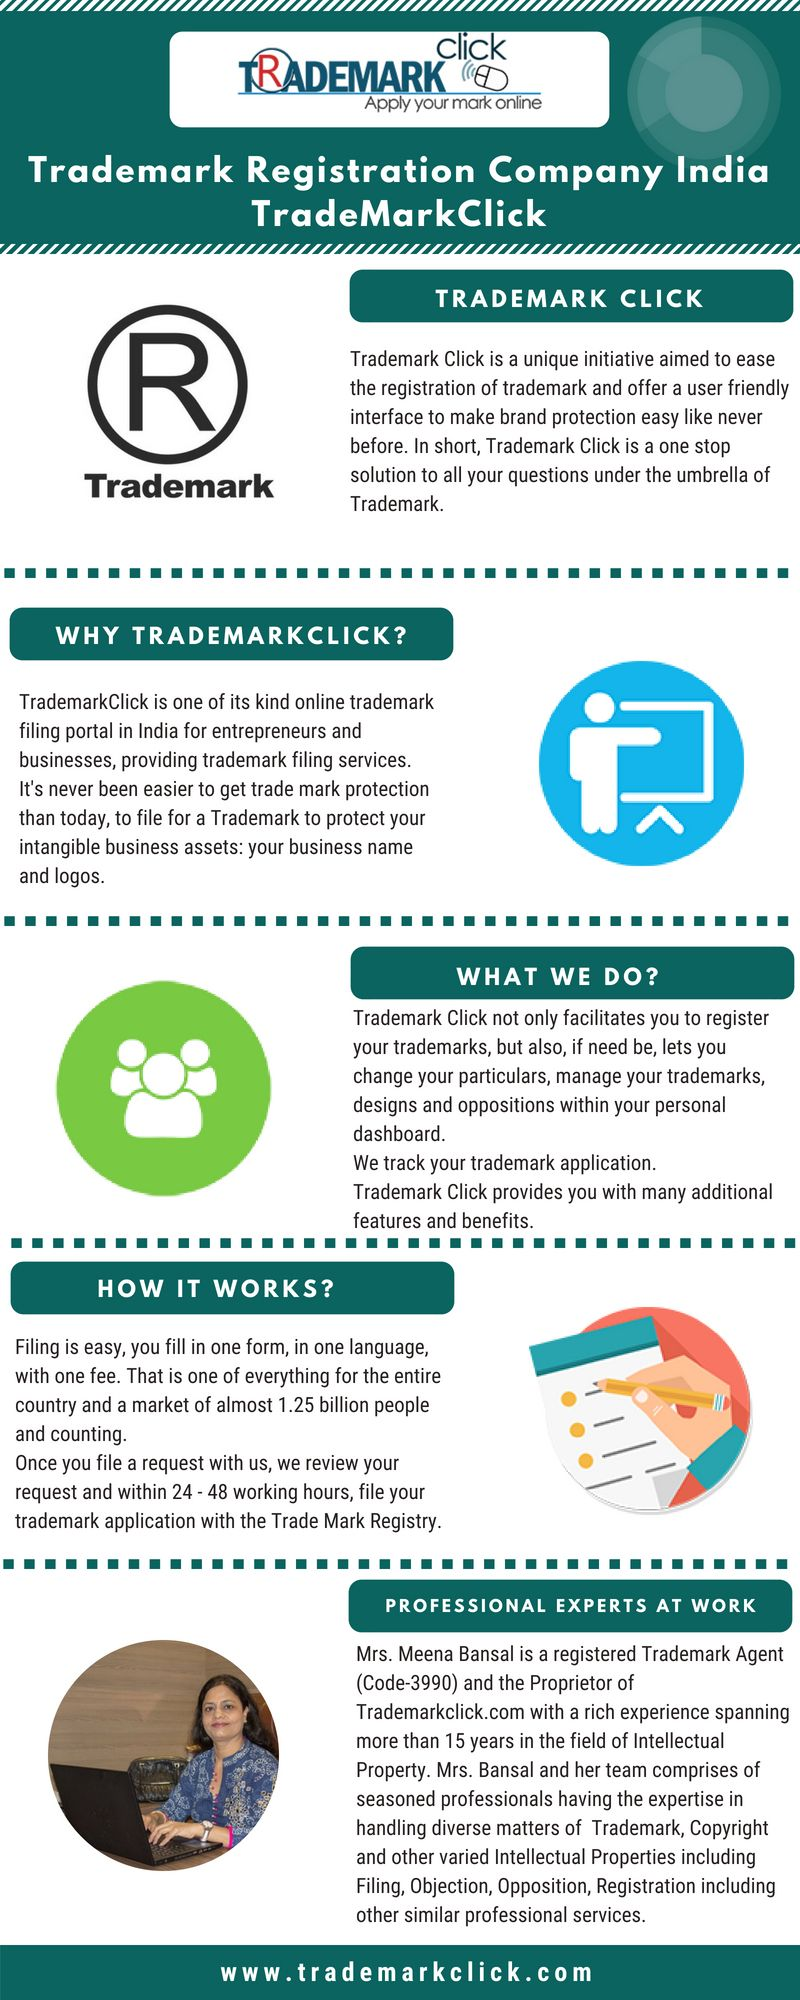 Contact Trademarkclick Https Www Trademarkclick Com 96 Sukhdev Vihar Mathura Road New Delhi 110025 Online Trading How To Apply This Or That Questions